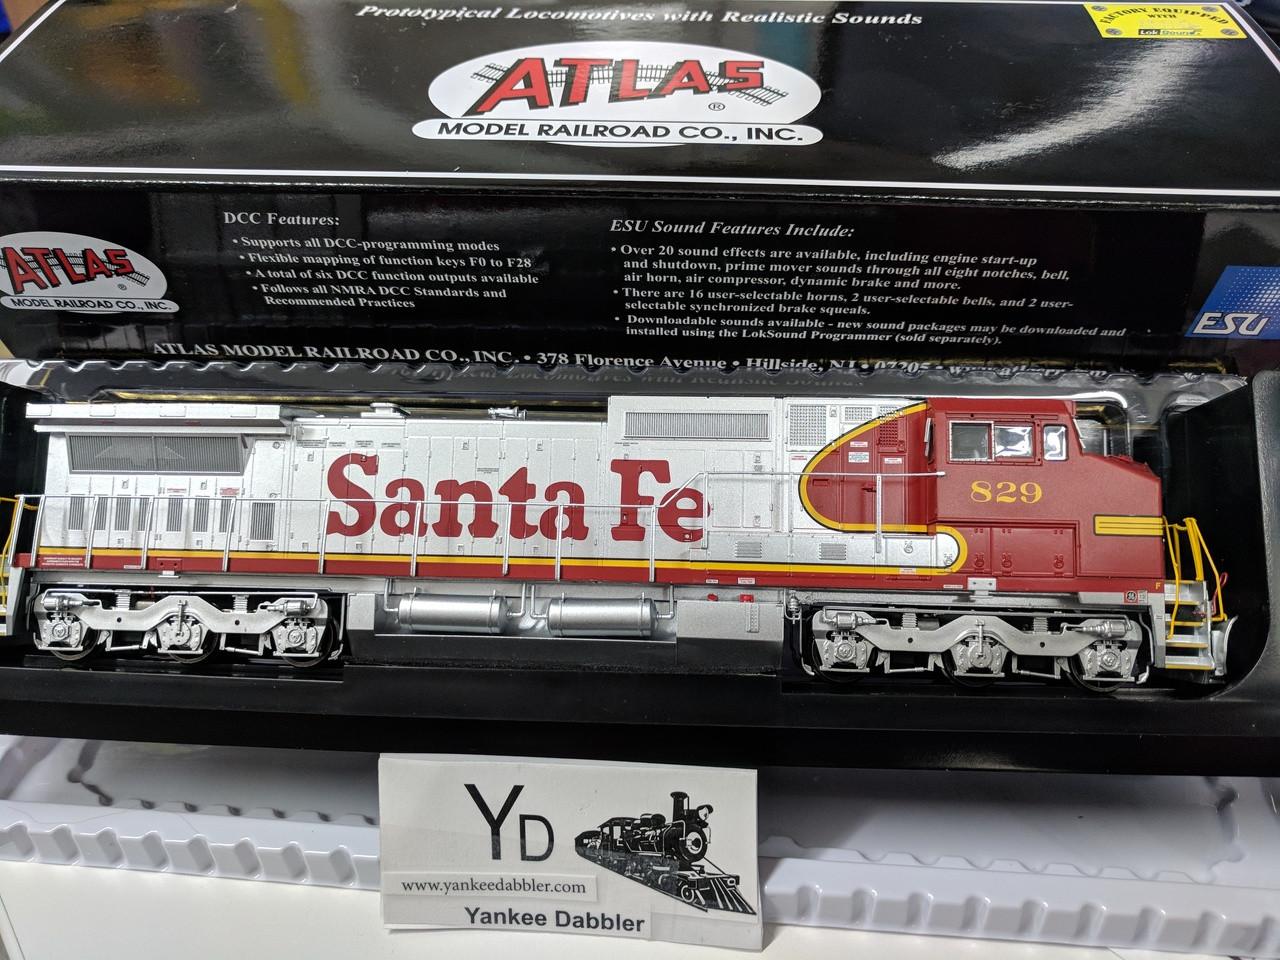 Atlas Model Railroad Co.  ATLAS 10002307 #829 GE Dash 8-40CW (ATSF Style) w/LokSound & DCC - Master(R) Gold